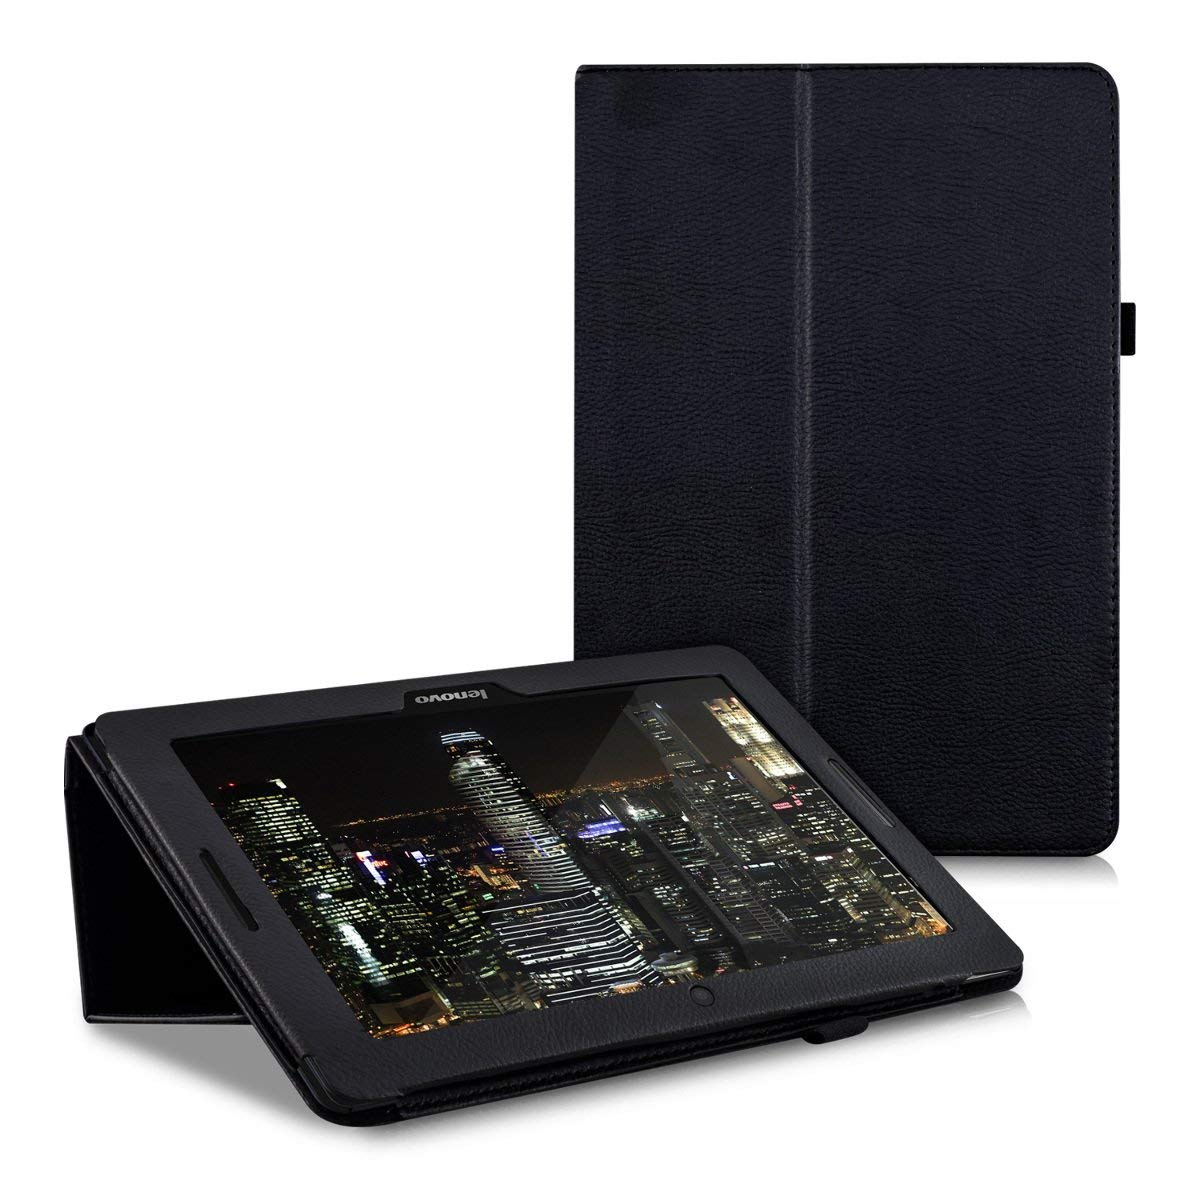 Para Lenovo Idea Tab A10-70 A7600 A7600h A7600f Flio Pu cuero Stand Tablet Cover para A7600 A10-80h 10,1 pulgadas de cristal